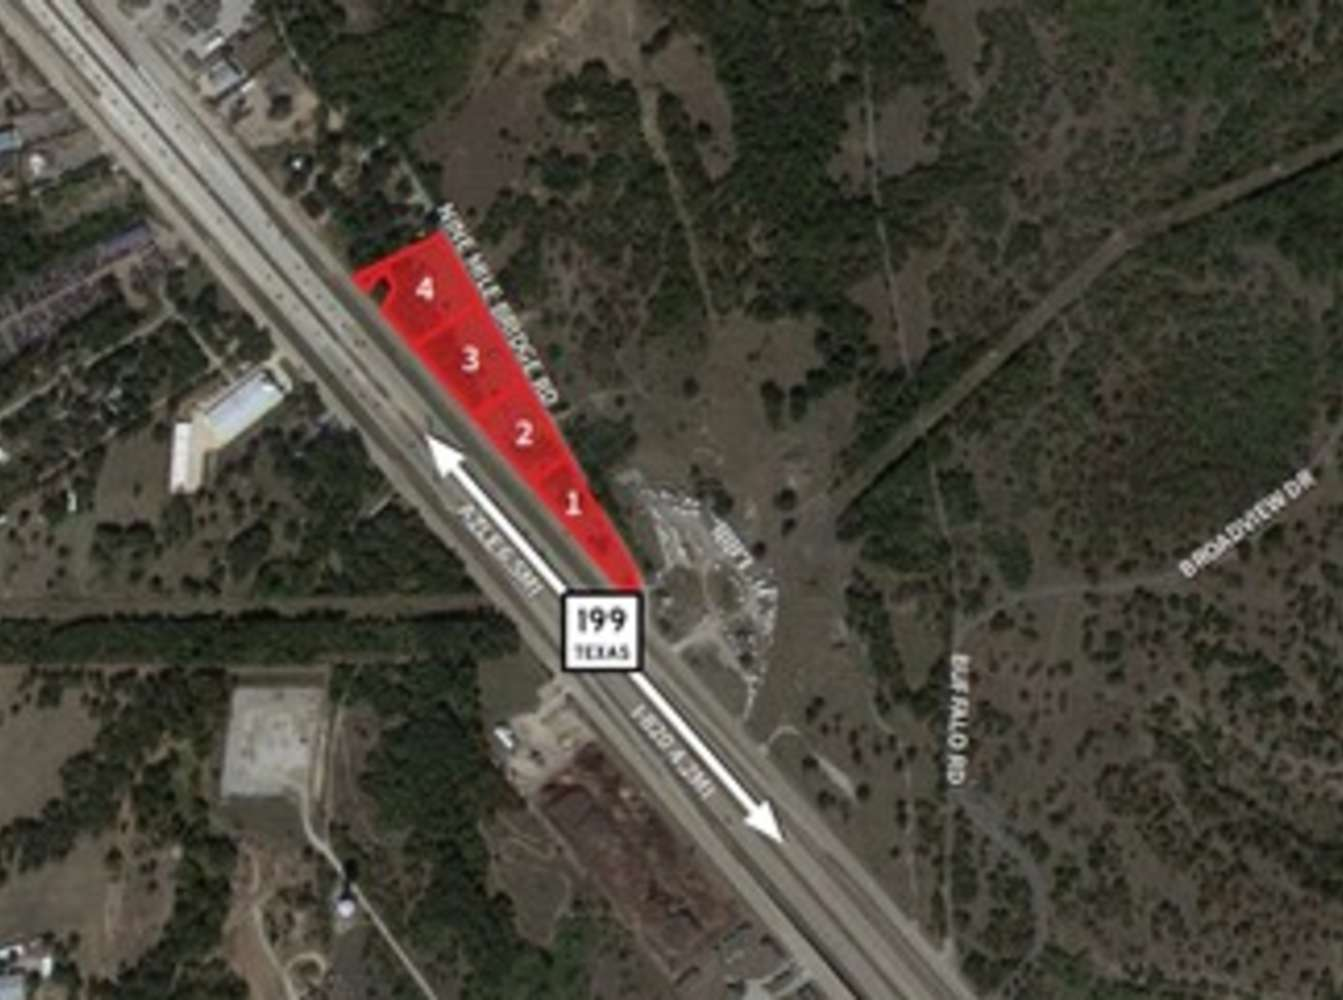 Land Fort worth, 76135 - 9150 Jacksboro Hwy